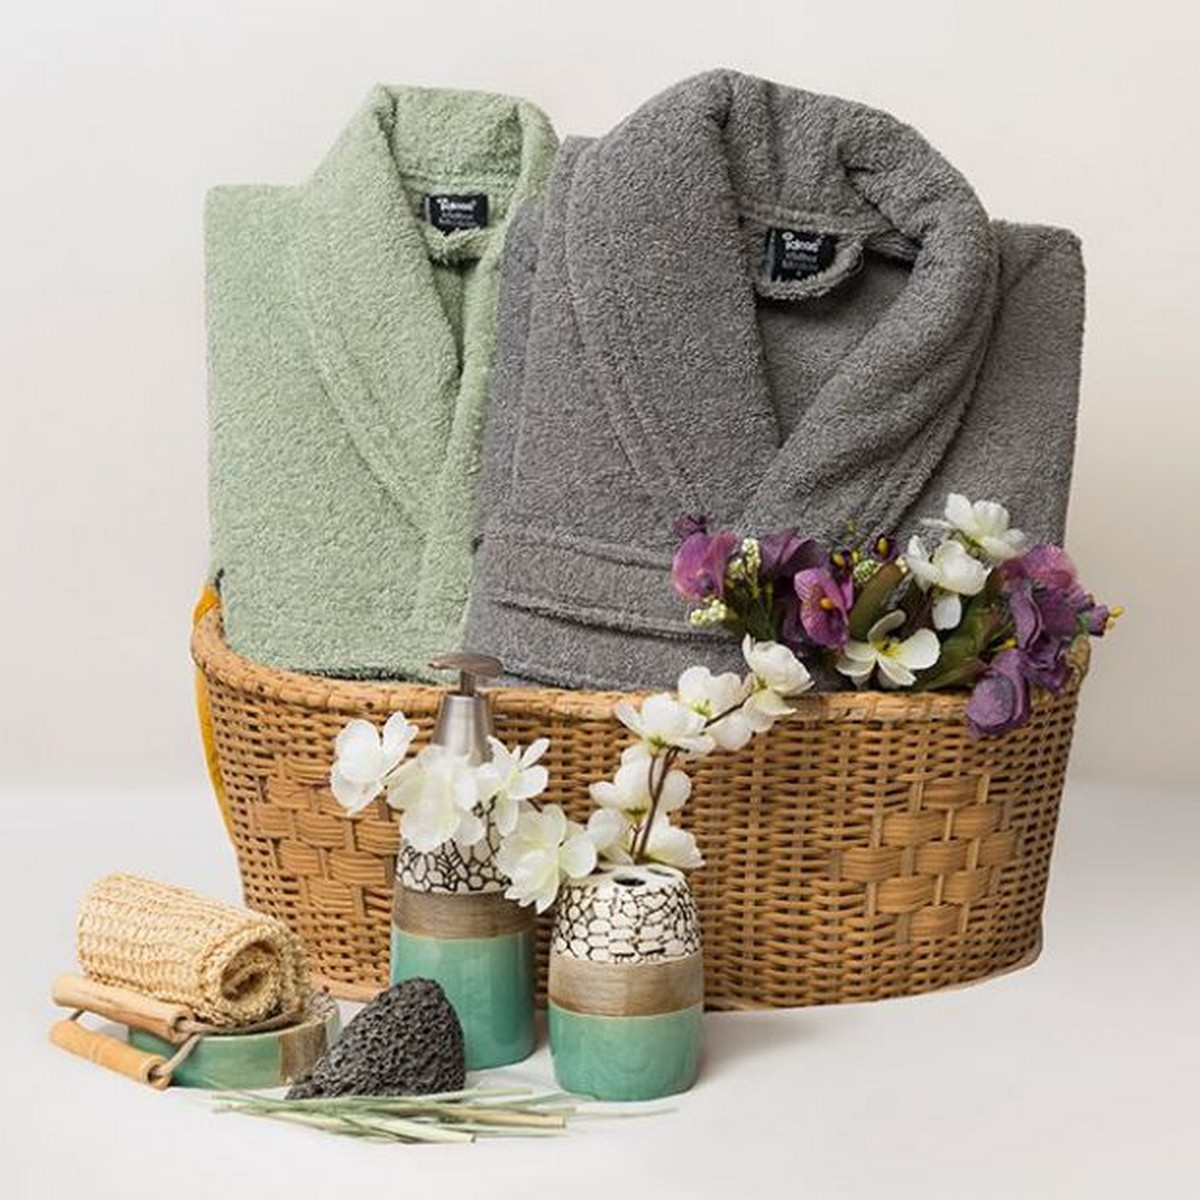 cotton bathrobe for men and women